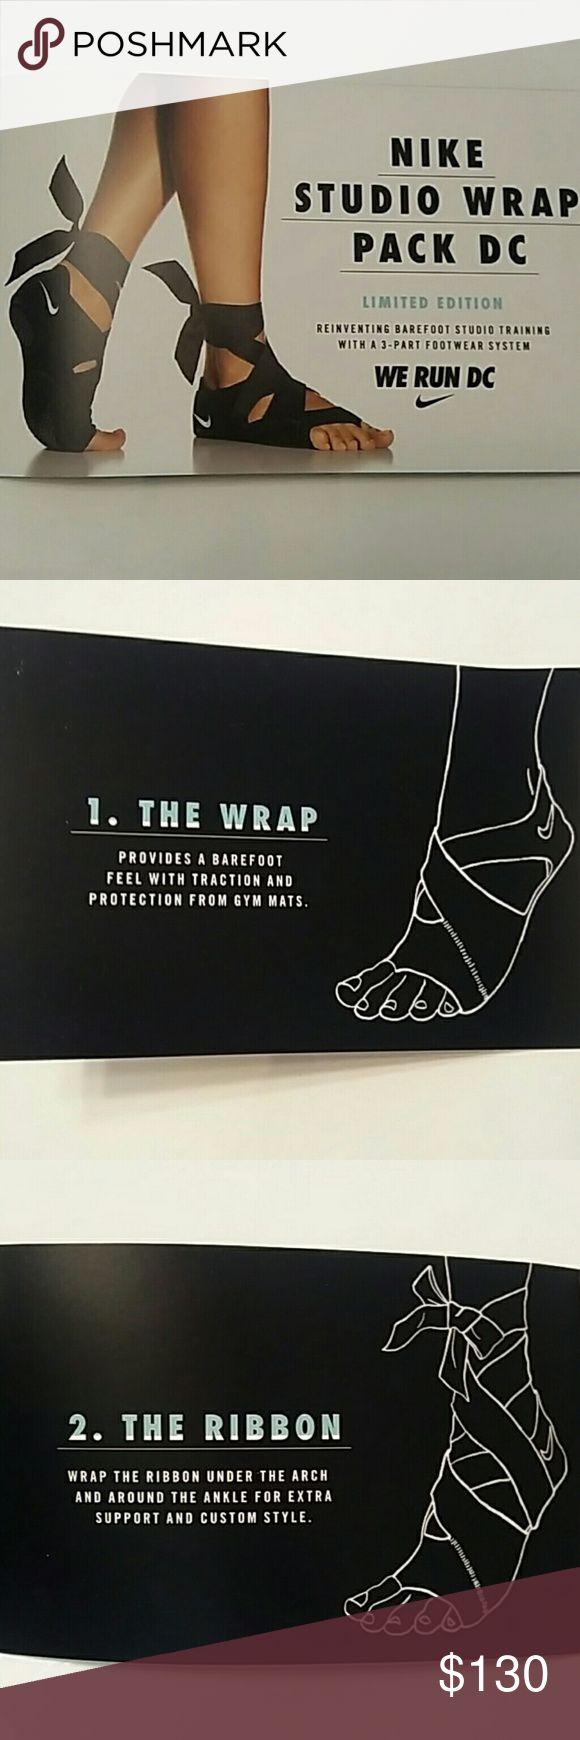 Fitness tools nike studio wraps - Nike Studio Wrap Pack Nwt